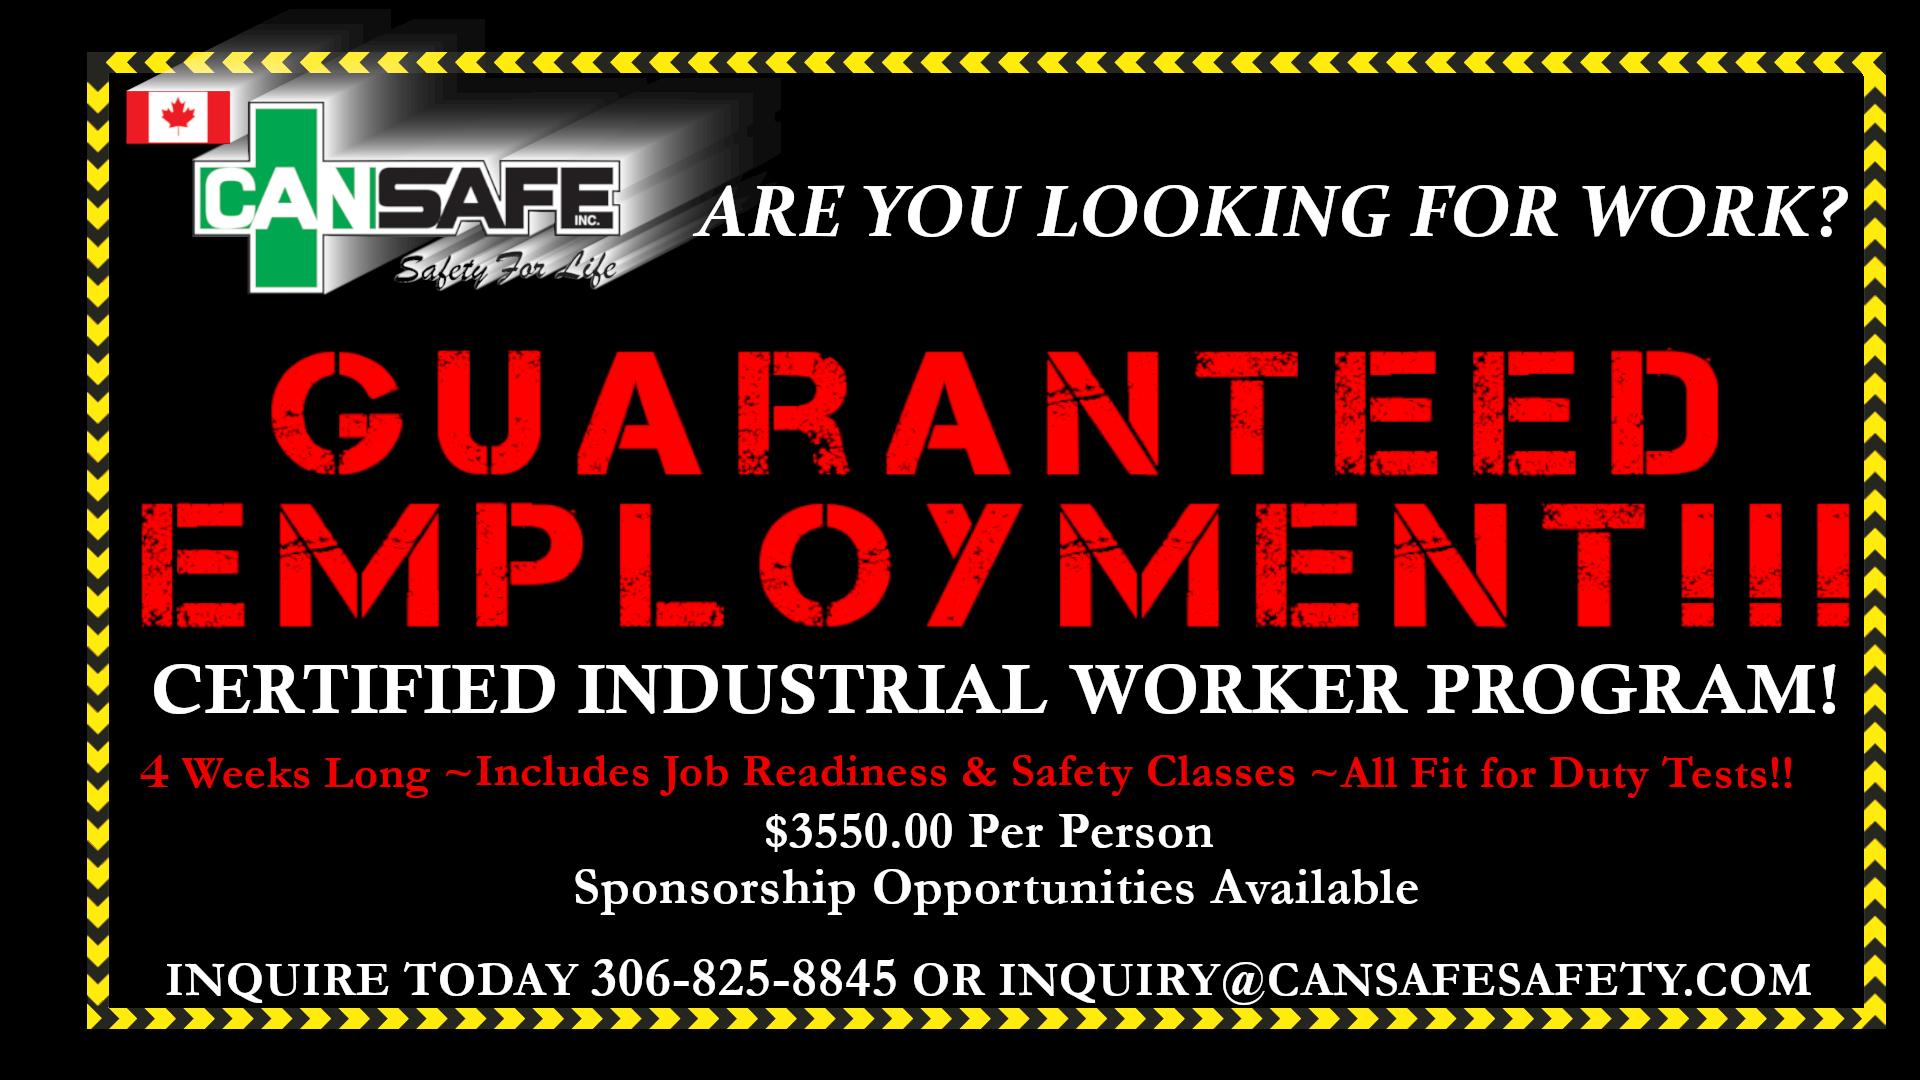 Certified Industrial Worker Program